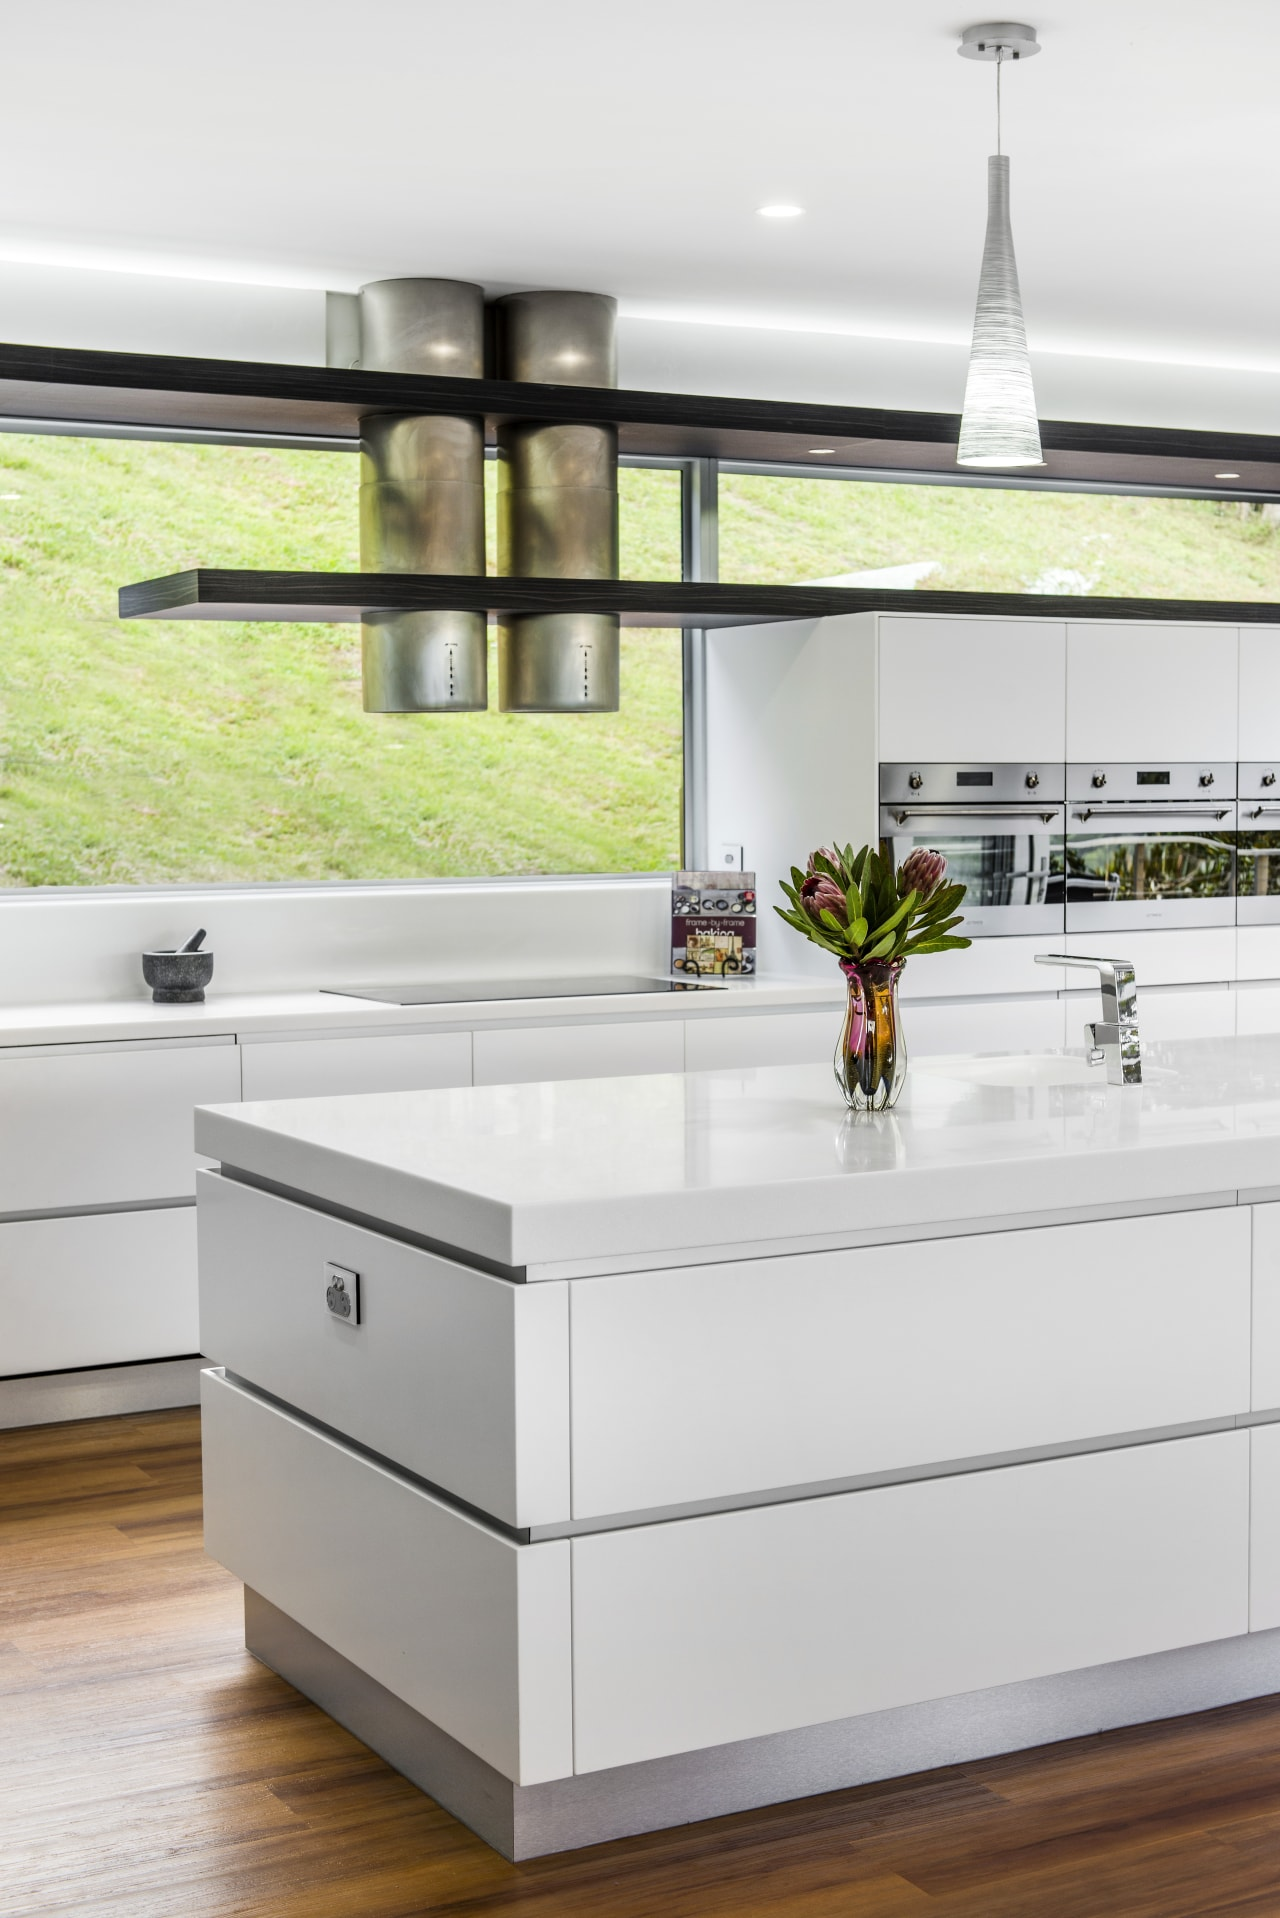 Sleek contemporary kitchen with Smeg appliances countertop, furniture, interior design, kitchen, product design, table, white